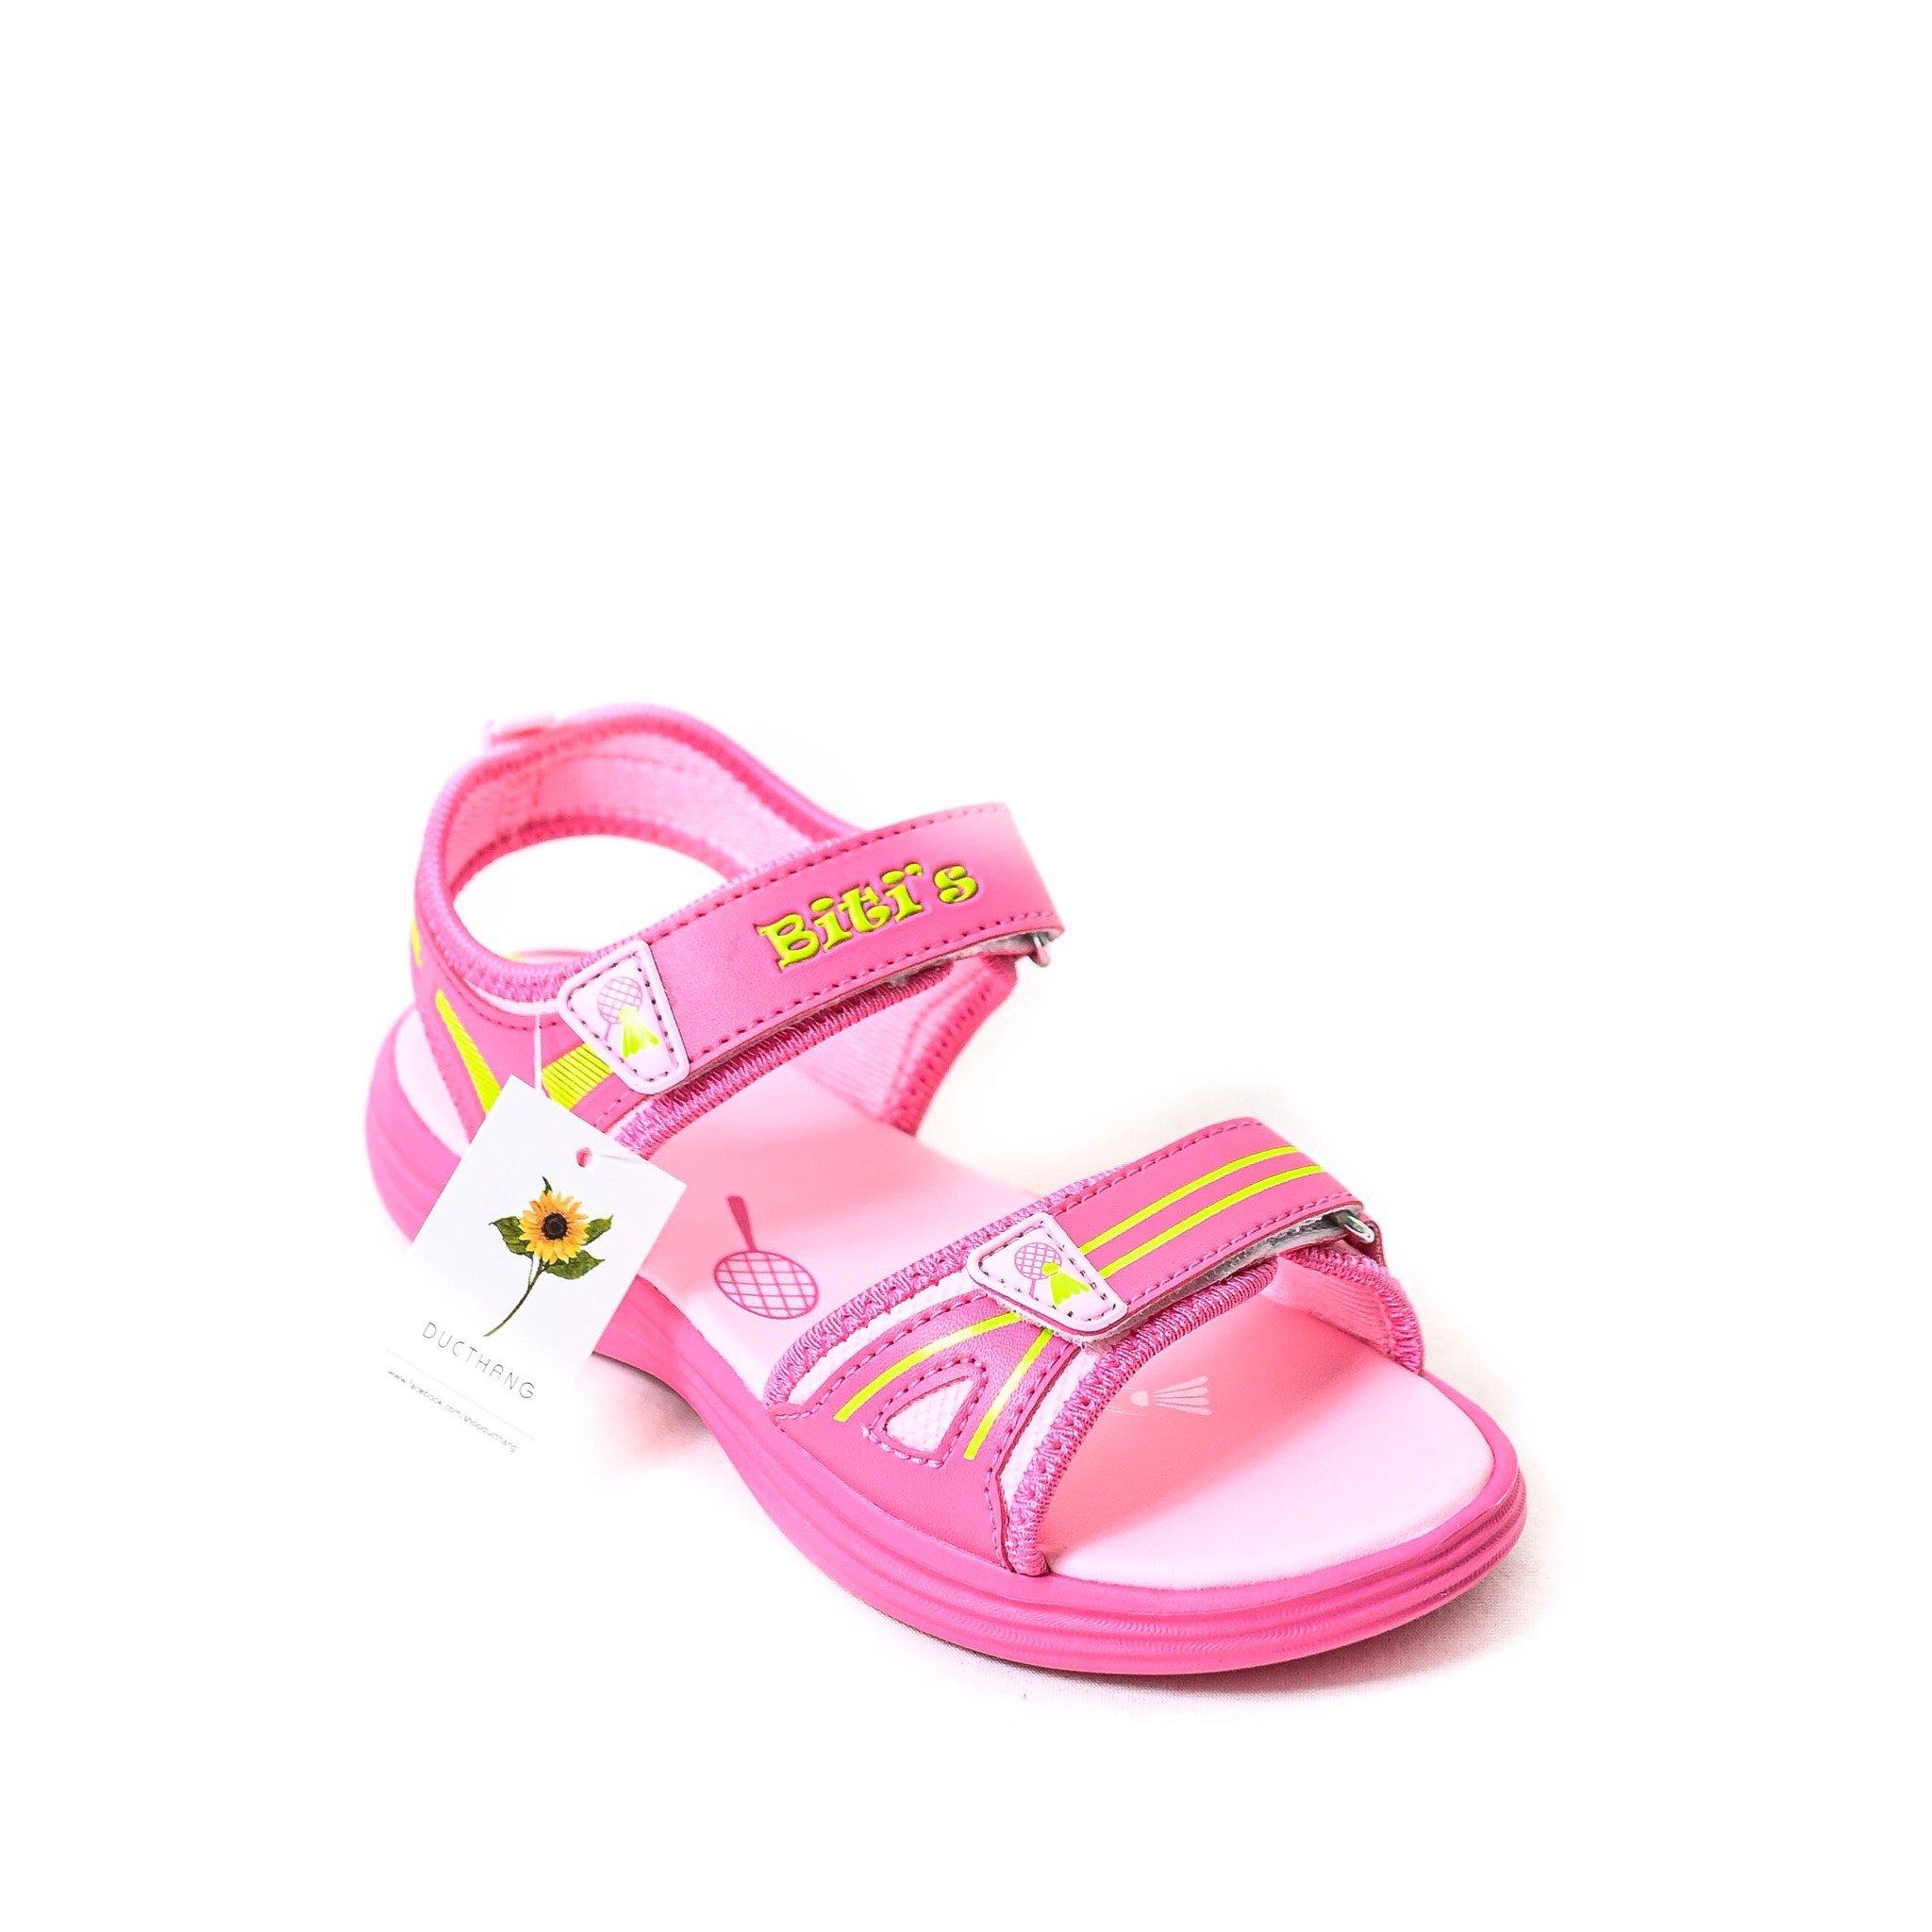 Sandal Bitis bé gái